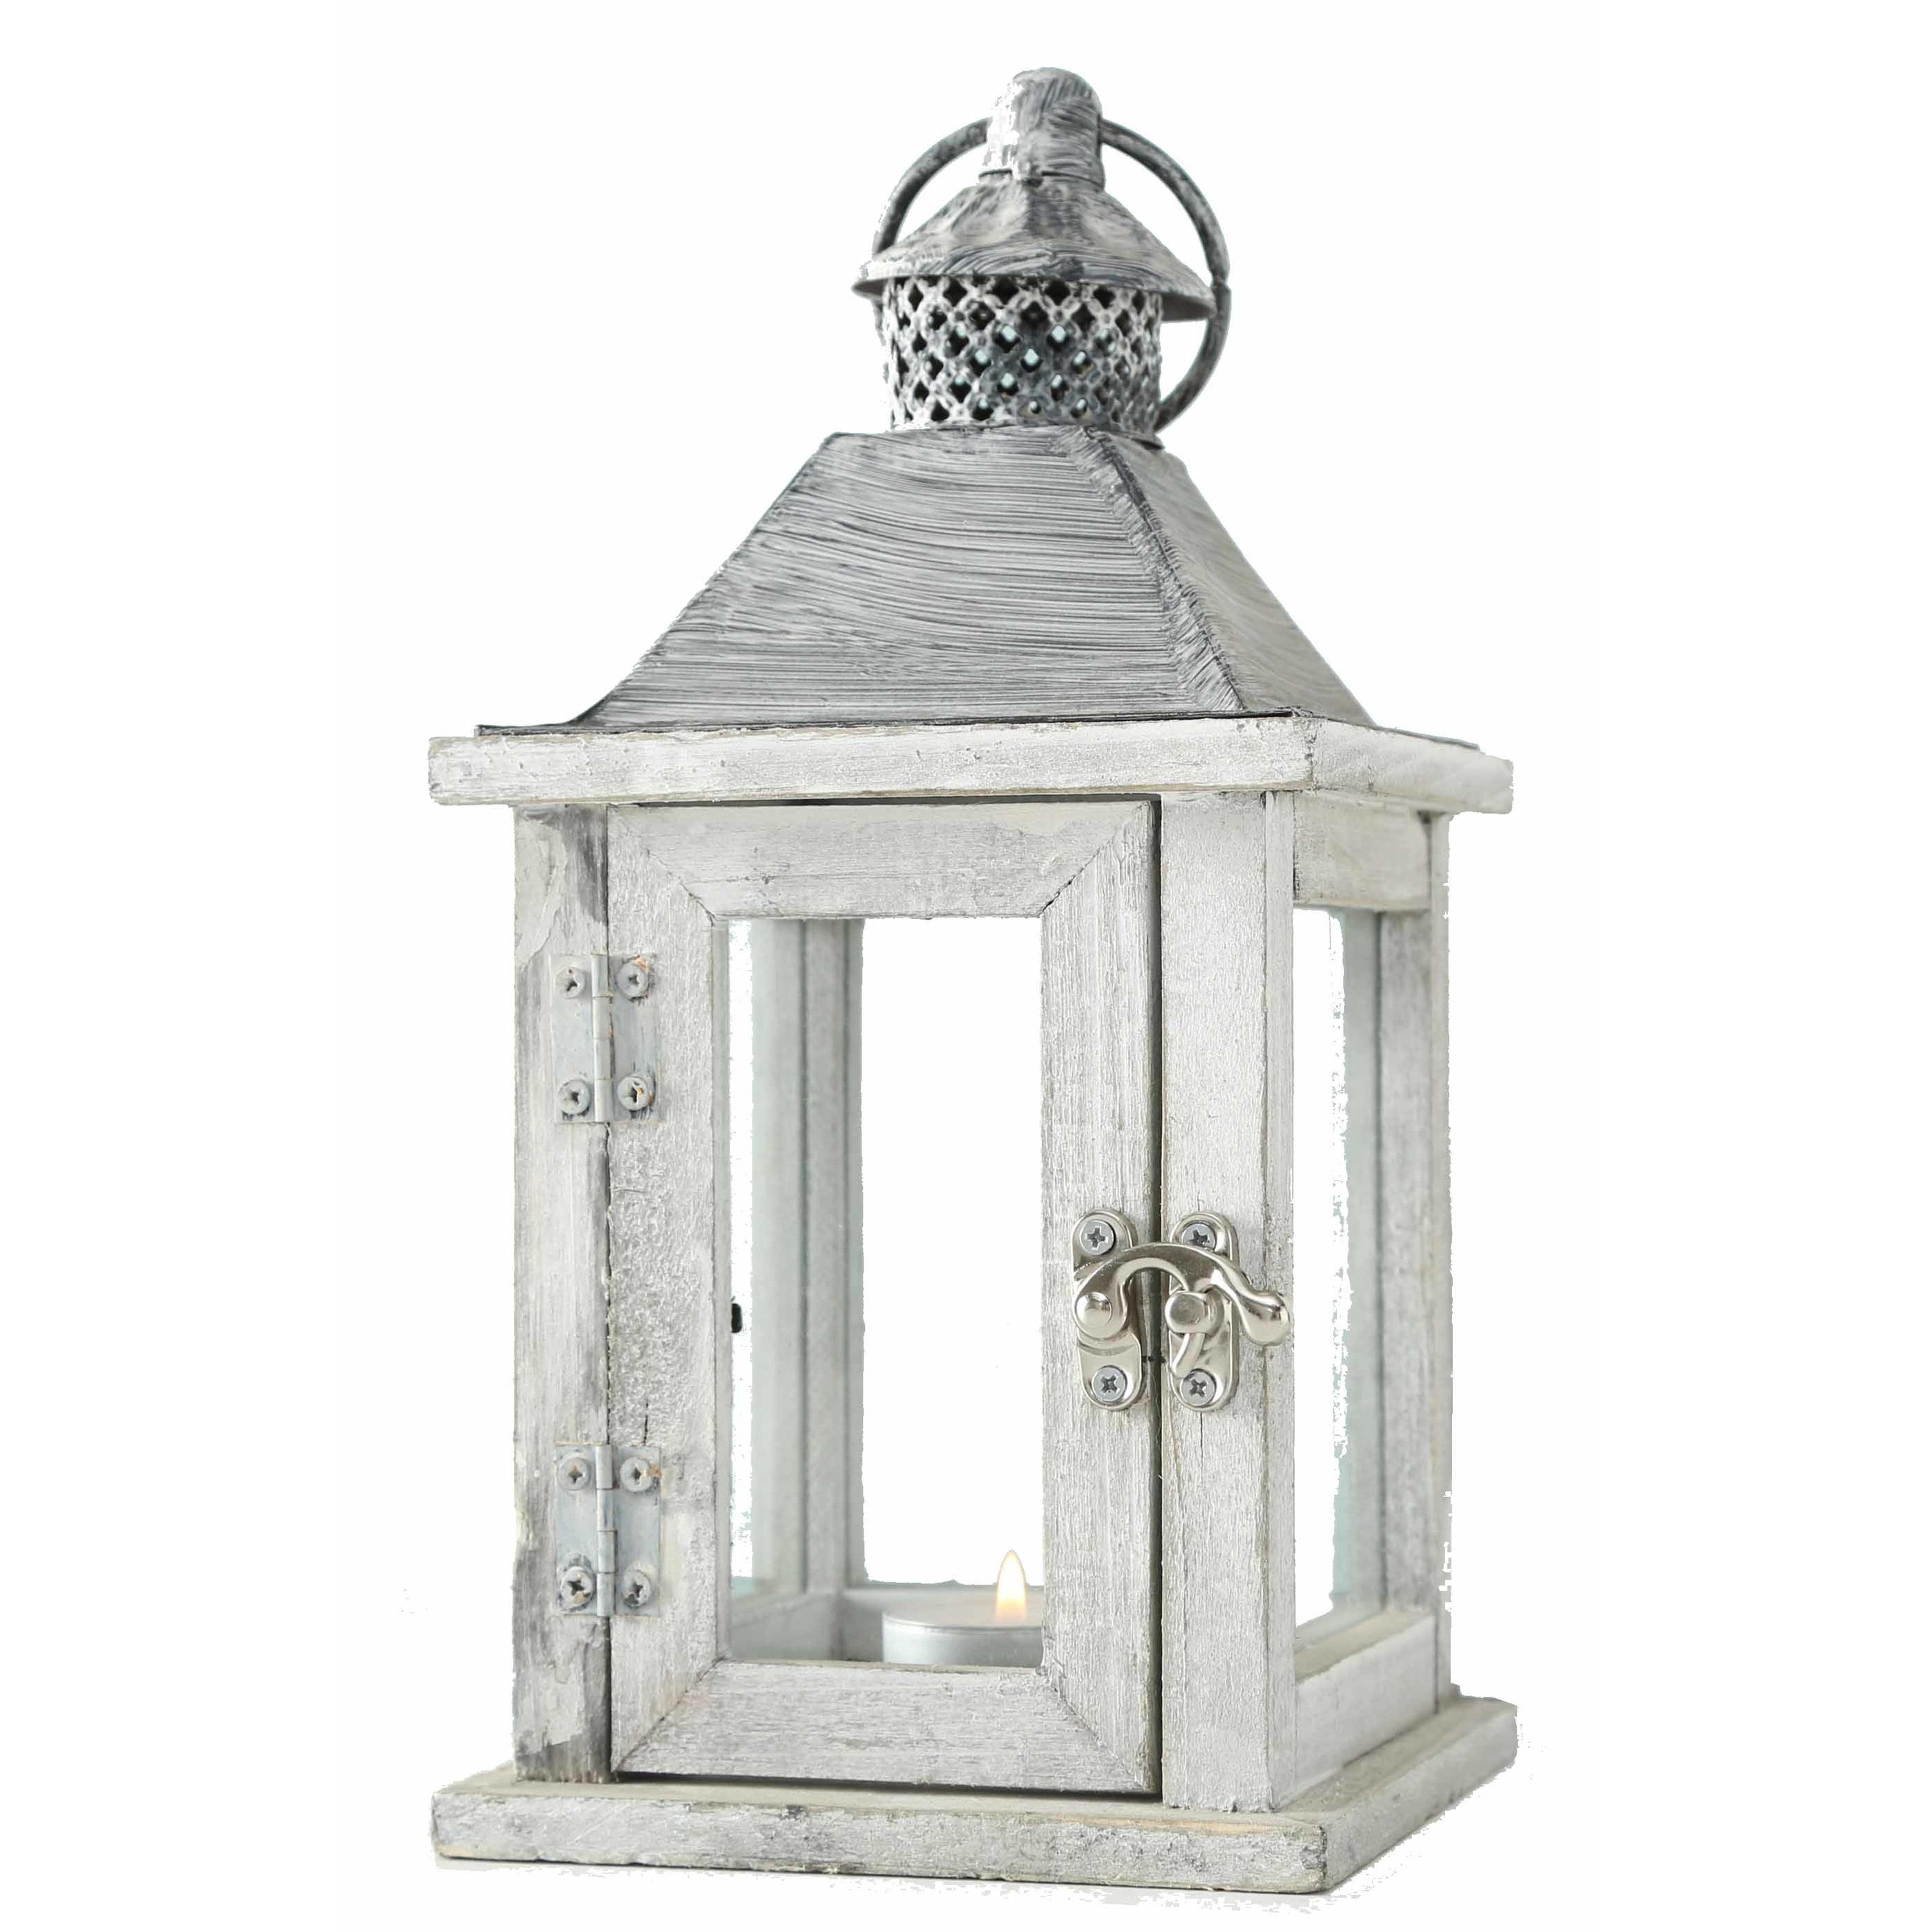 1x Houten lantaarn-windlicht kaarsenhouders wit 13 x 25 cm